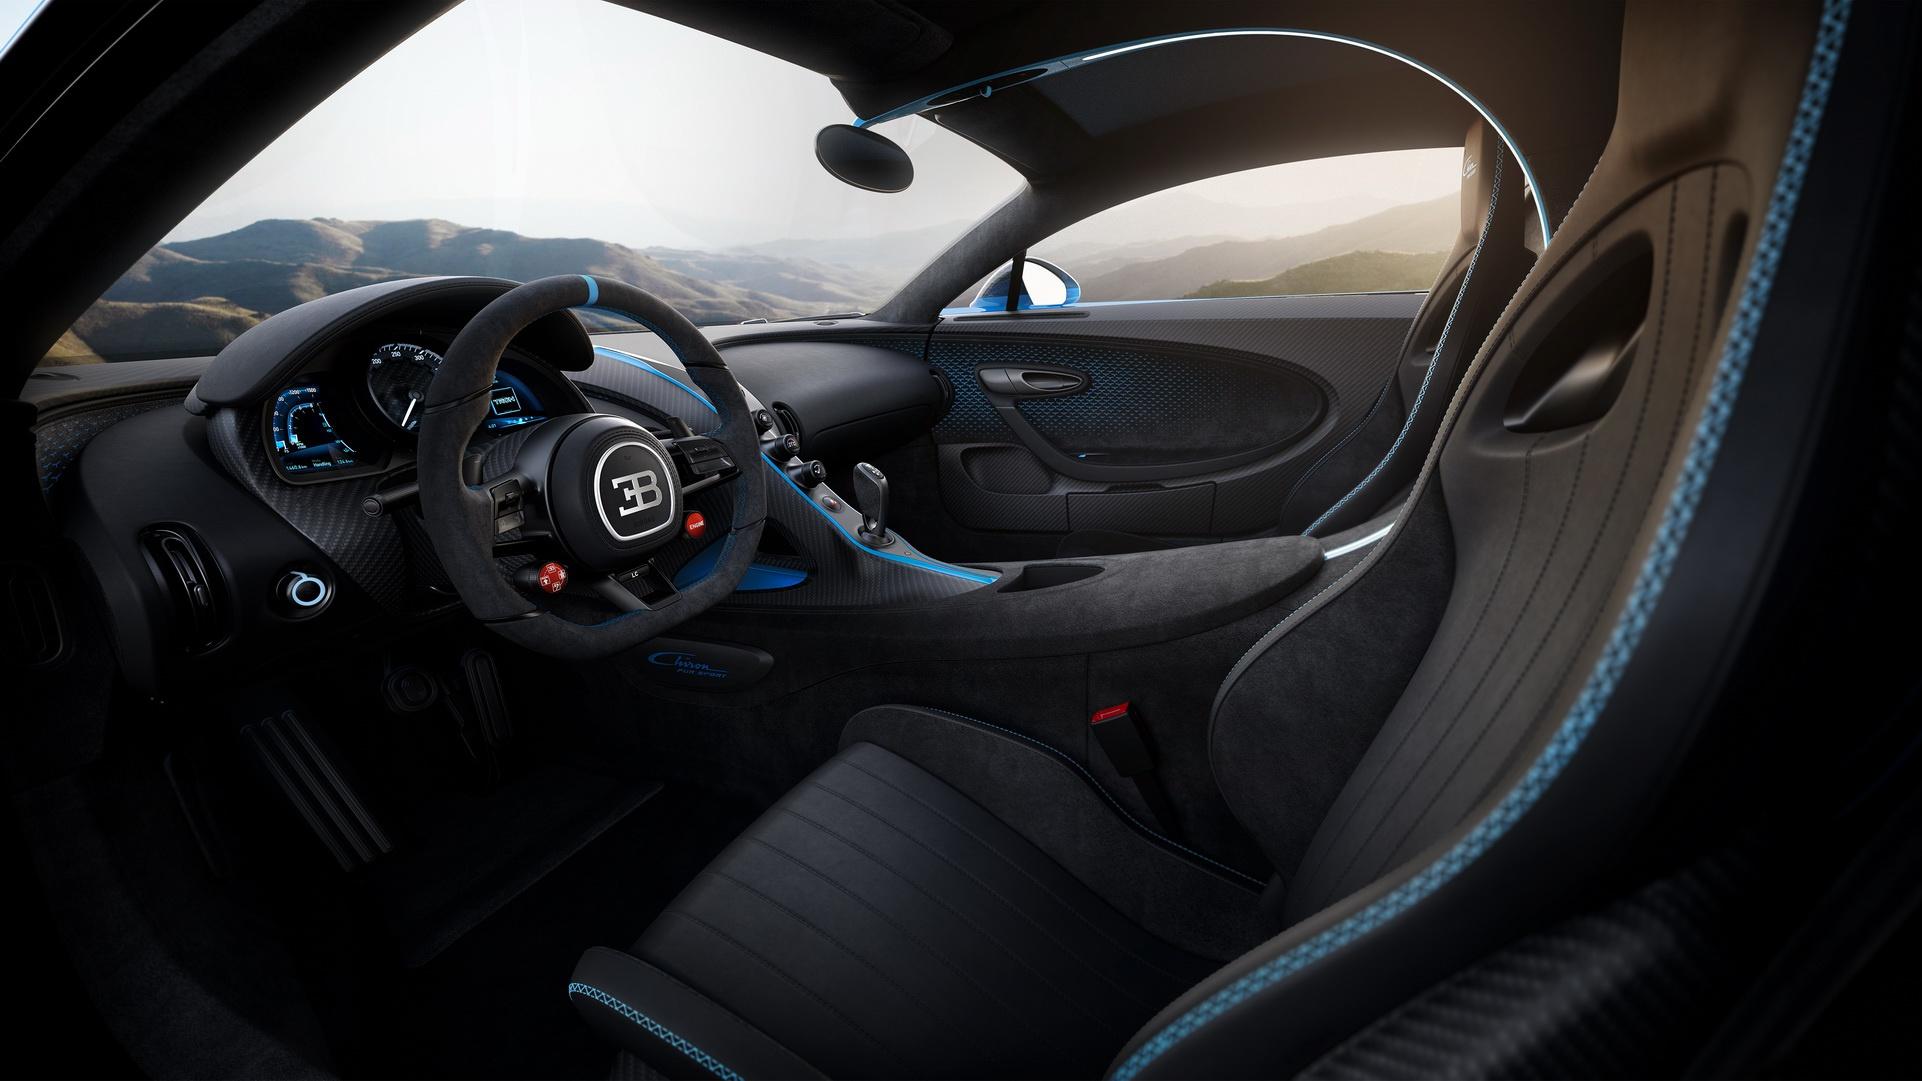 Bugatti Chiron phien ban moi ra mat - sieu xe gia 3,55 trieu USD hinh anh 20 C.jpg